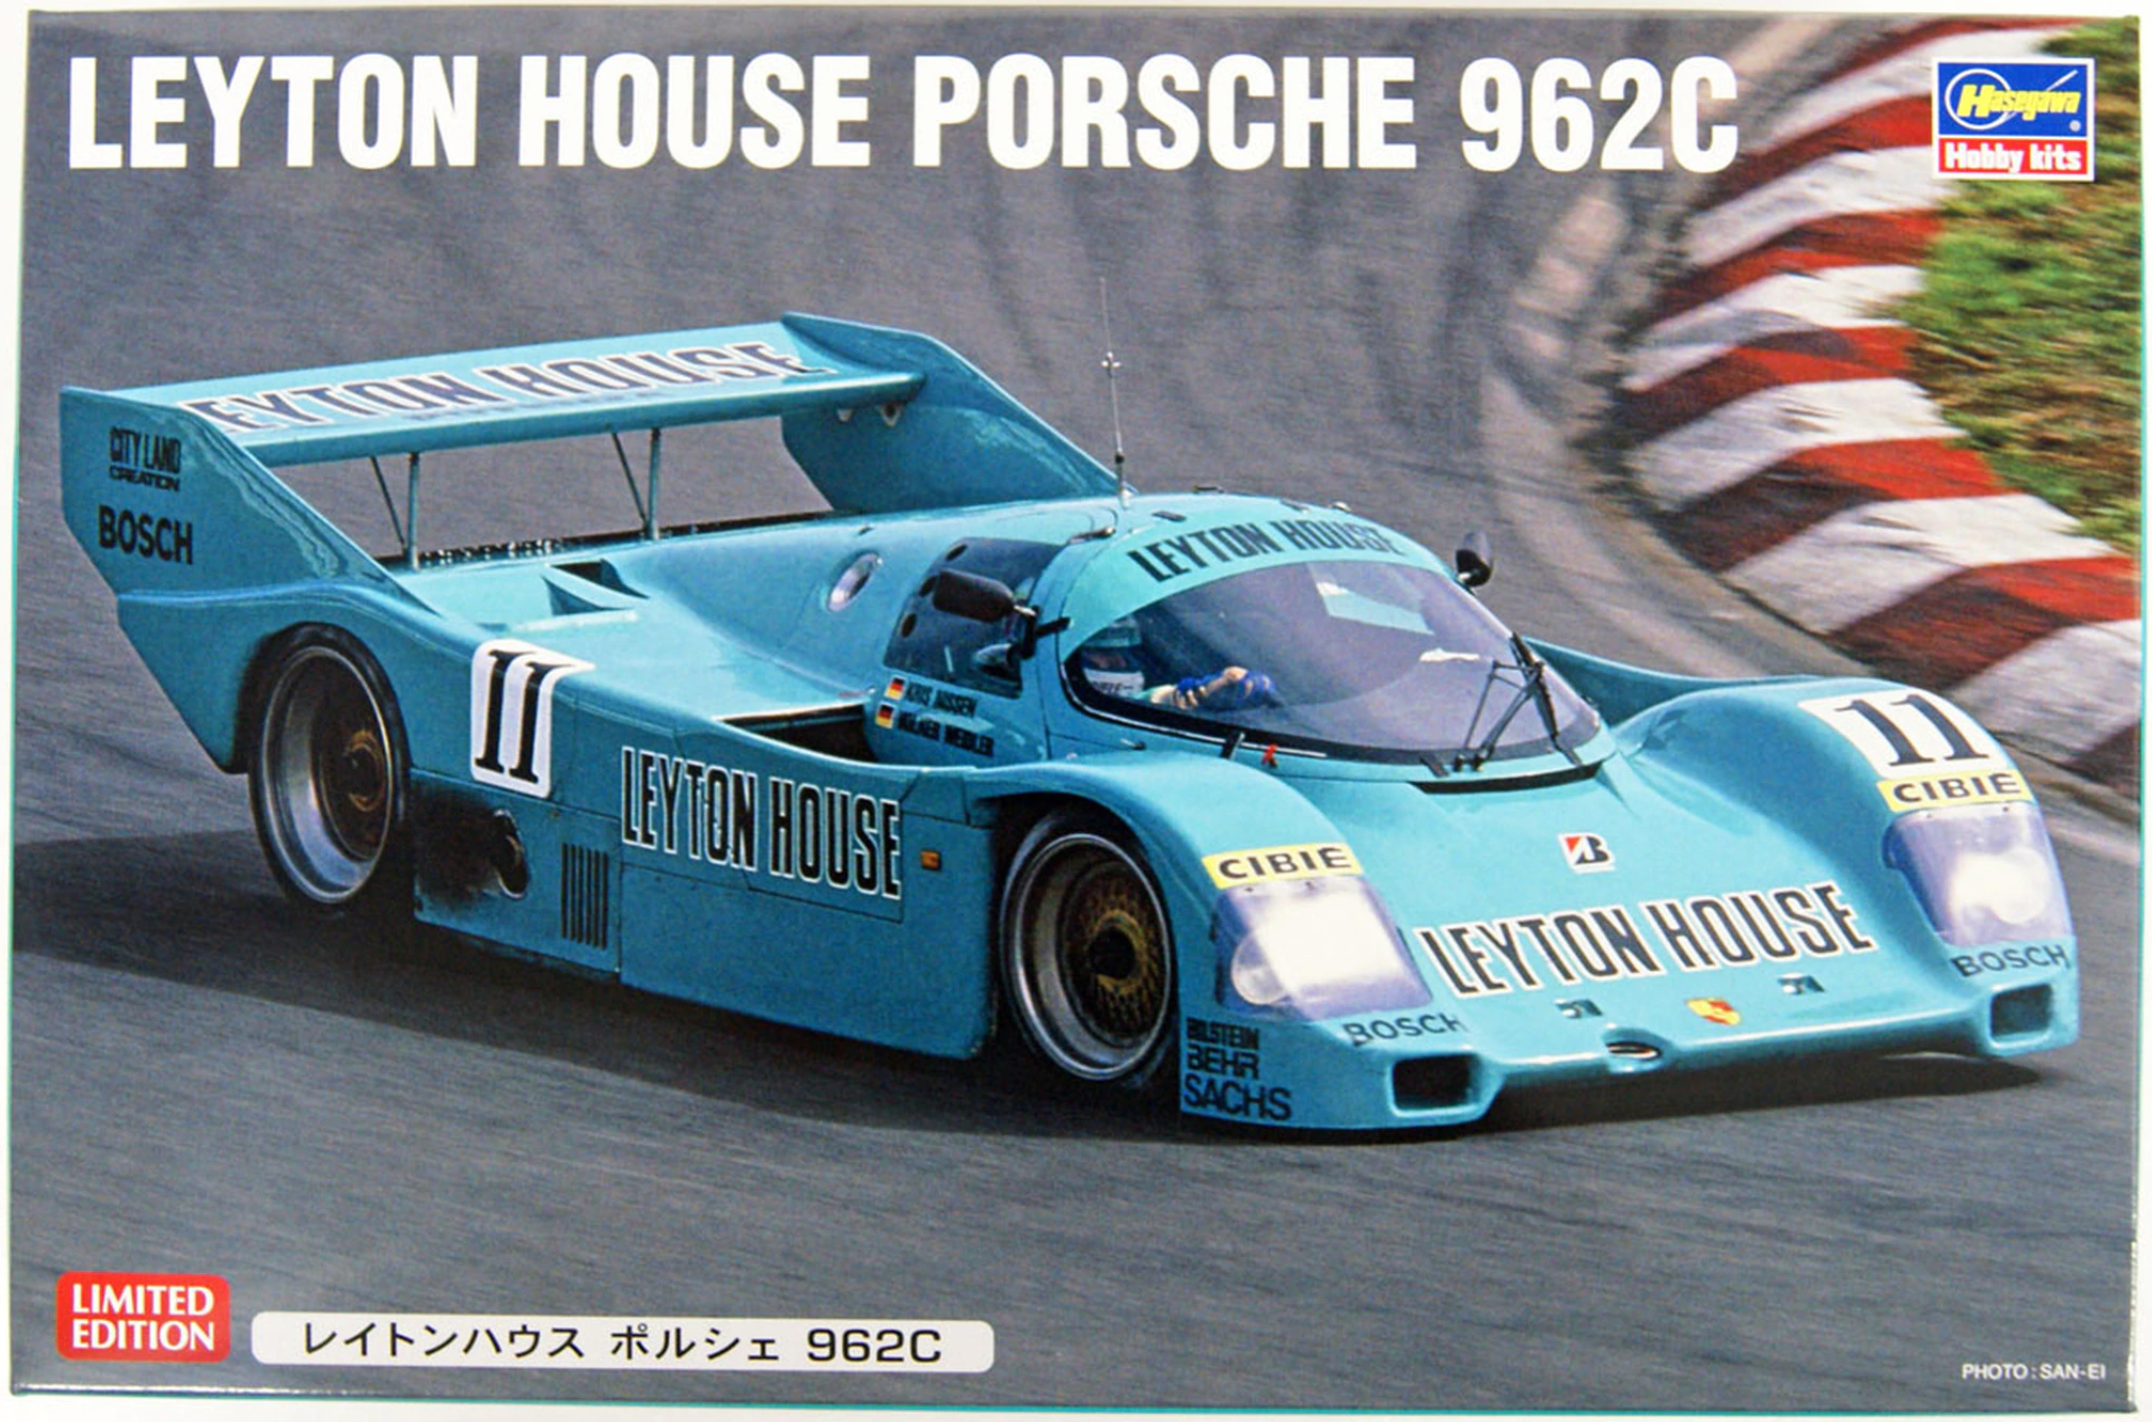 Hasegawa 1/24 LEYTON HOUSE PORSCHE 962C